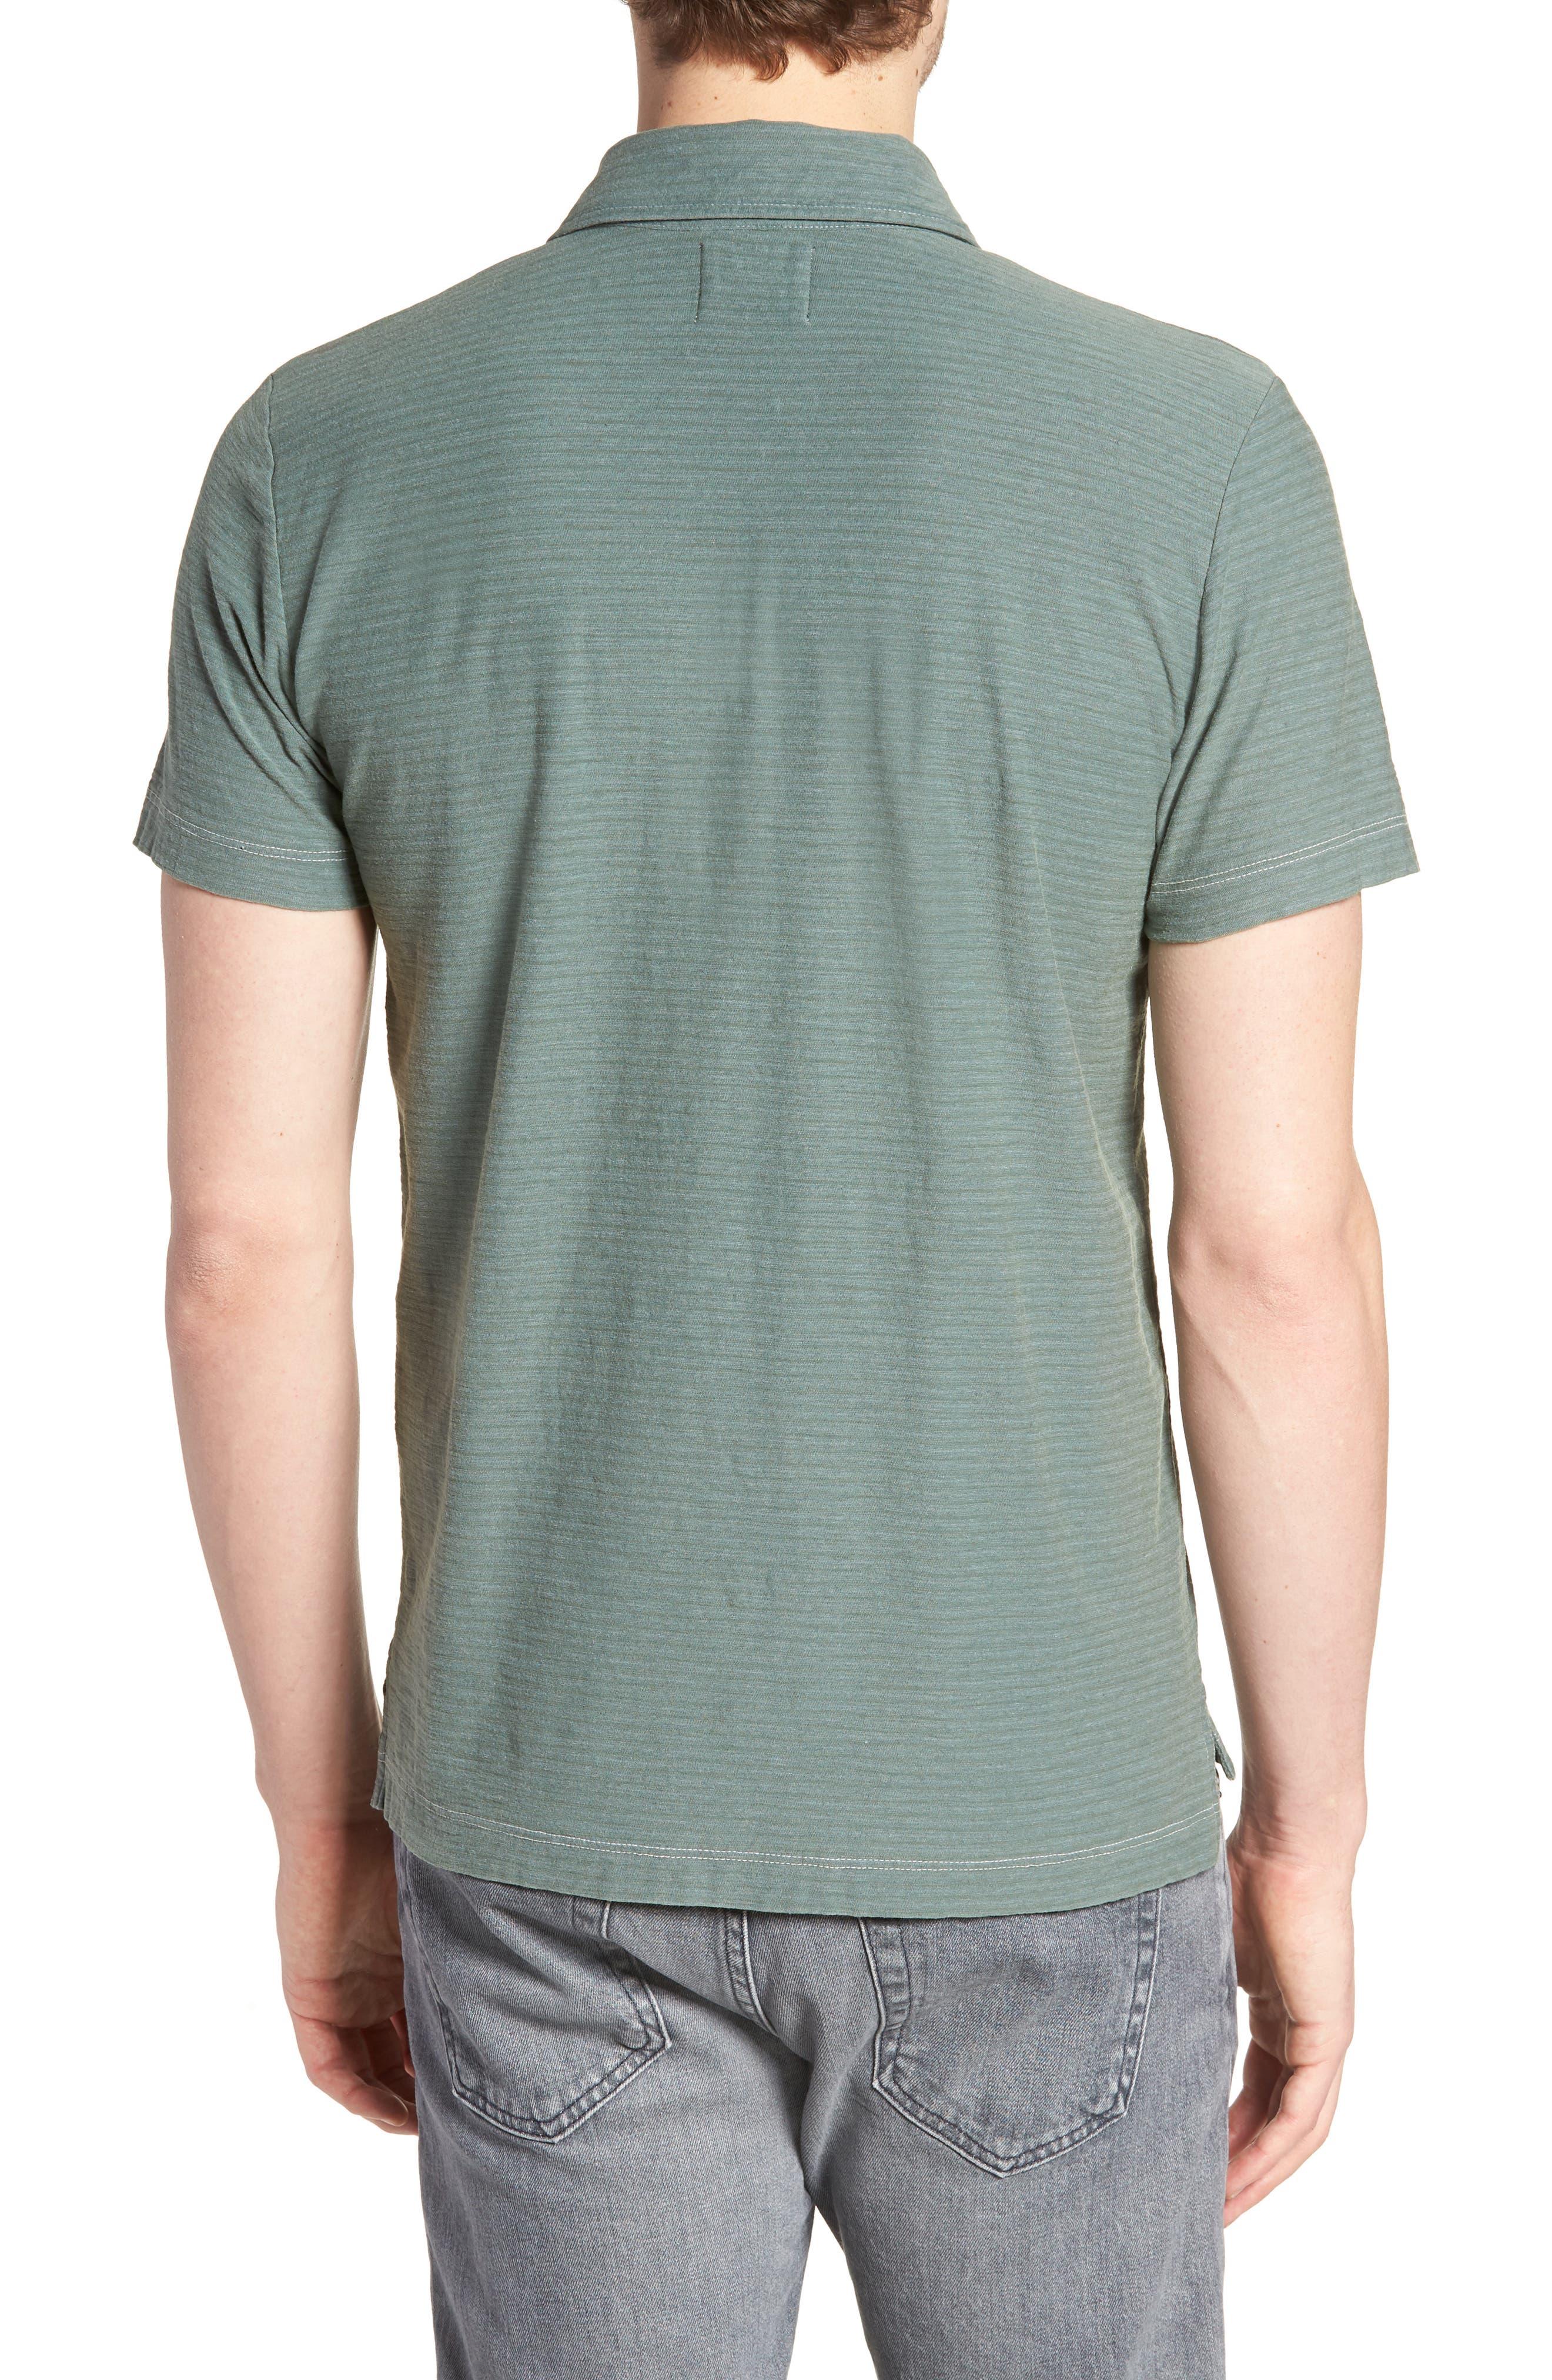 Pensacola Cotton Blend Polo Shirt,                             Alternate thumbnail 2, color,                             SAGE